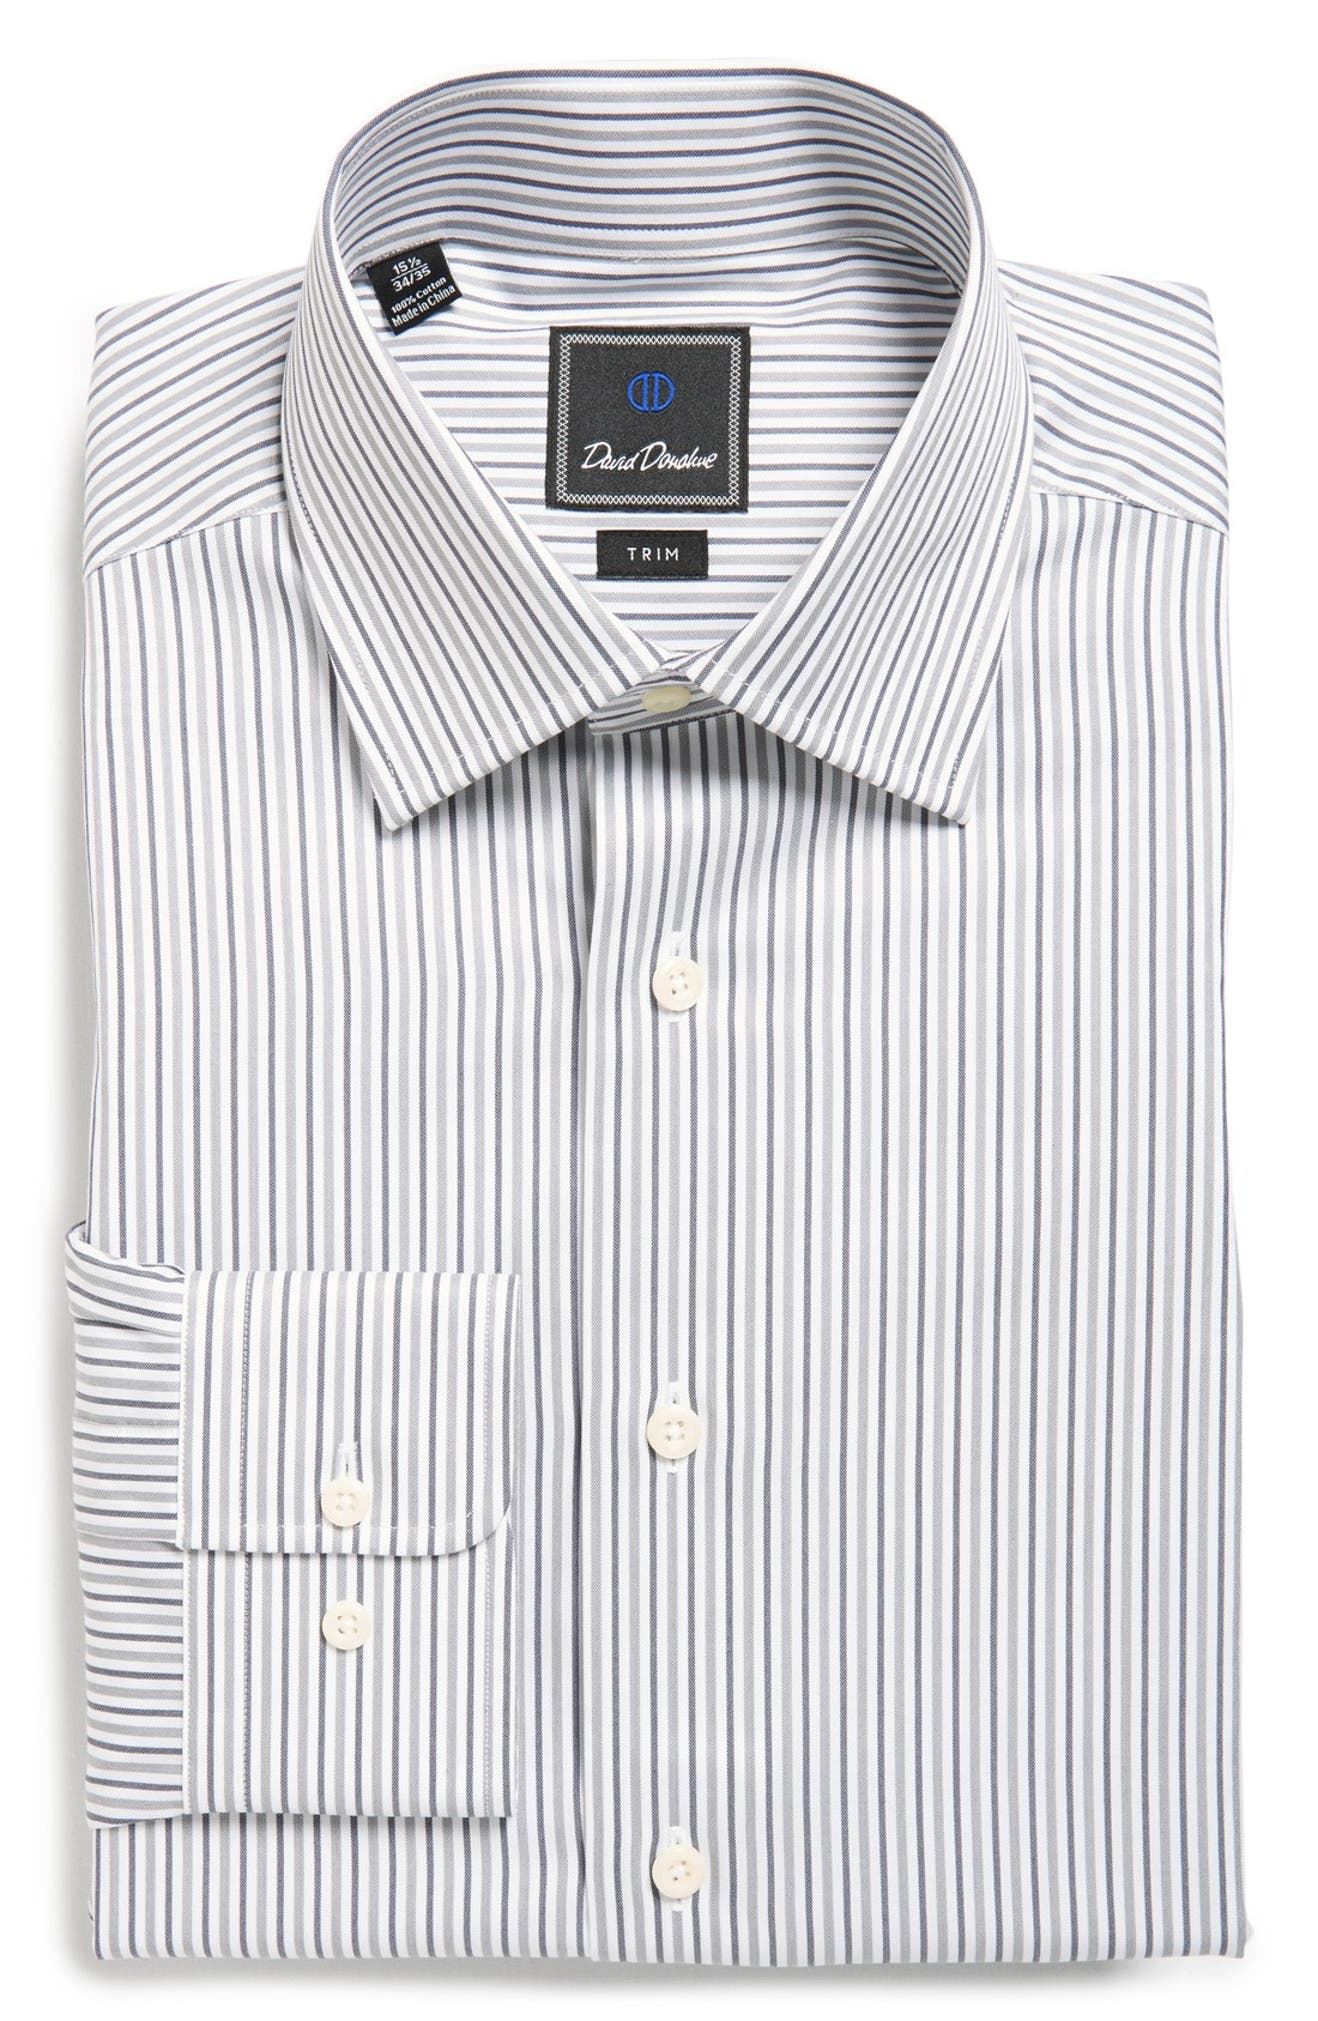 David Donahue Trim Fit Stripe Dress Shirt Nordstrom